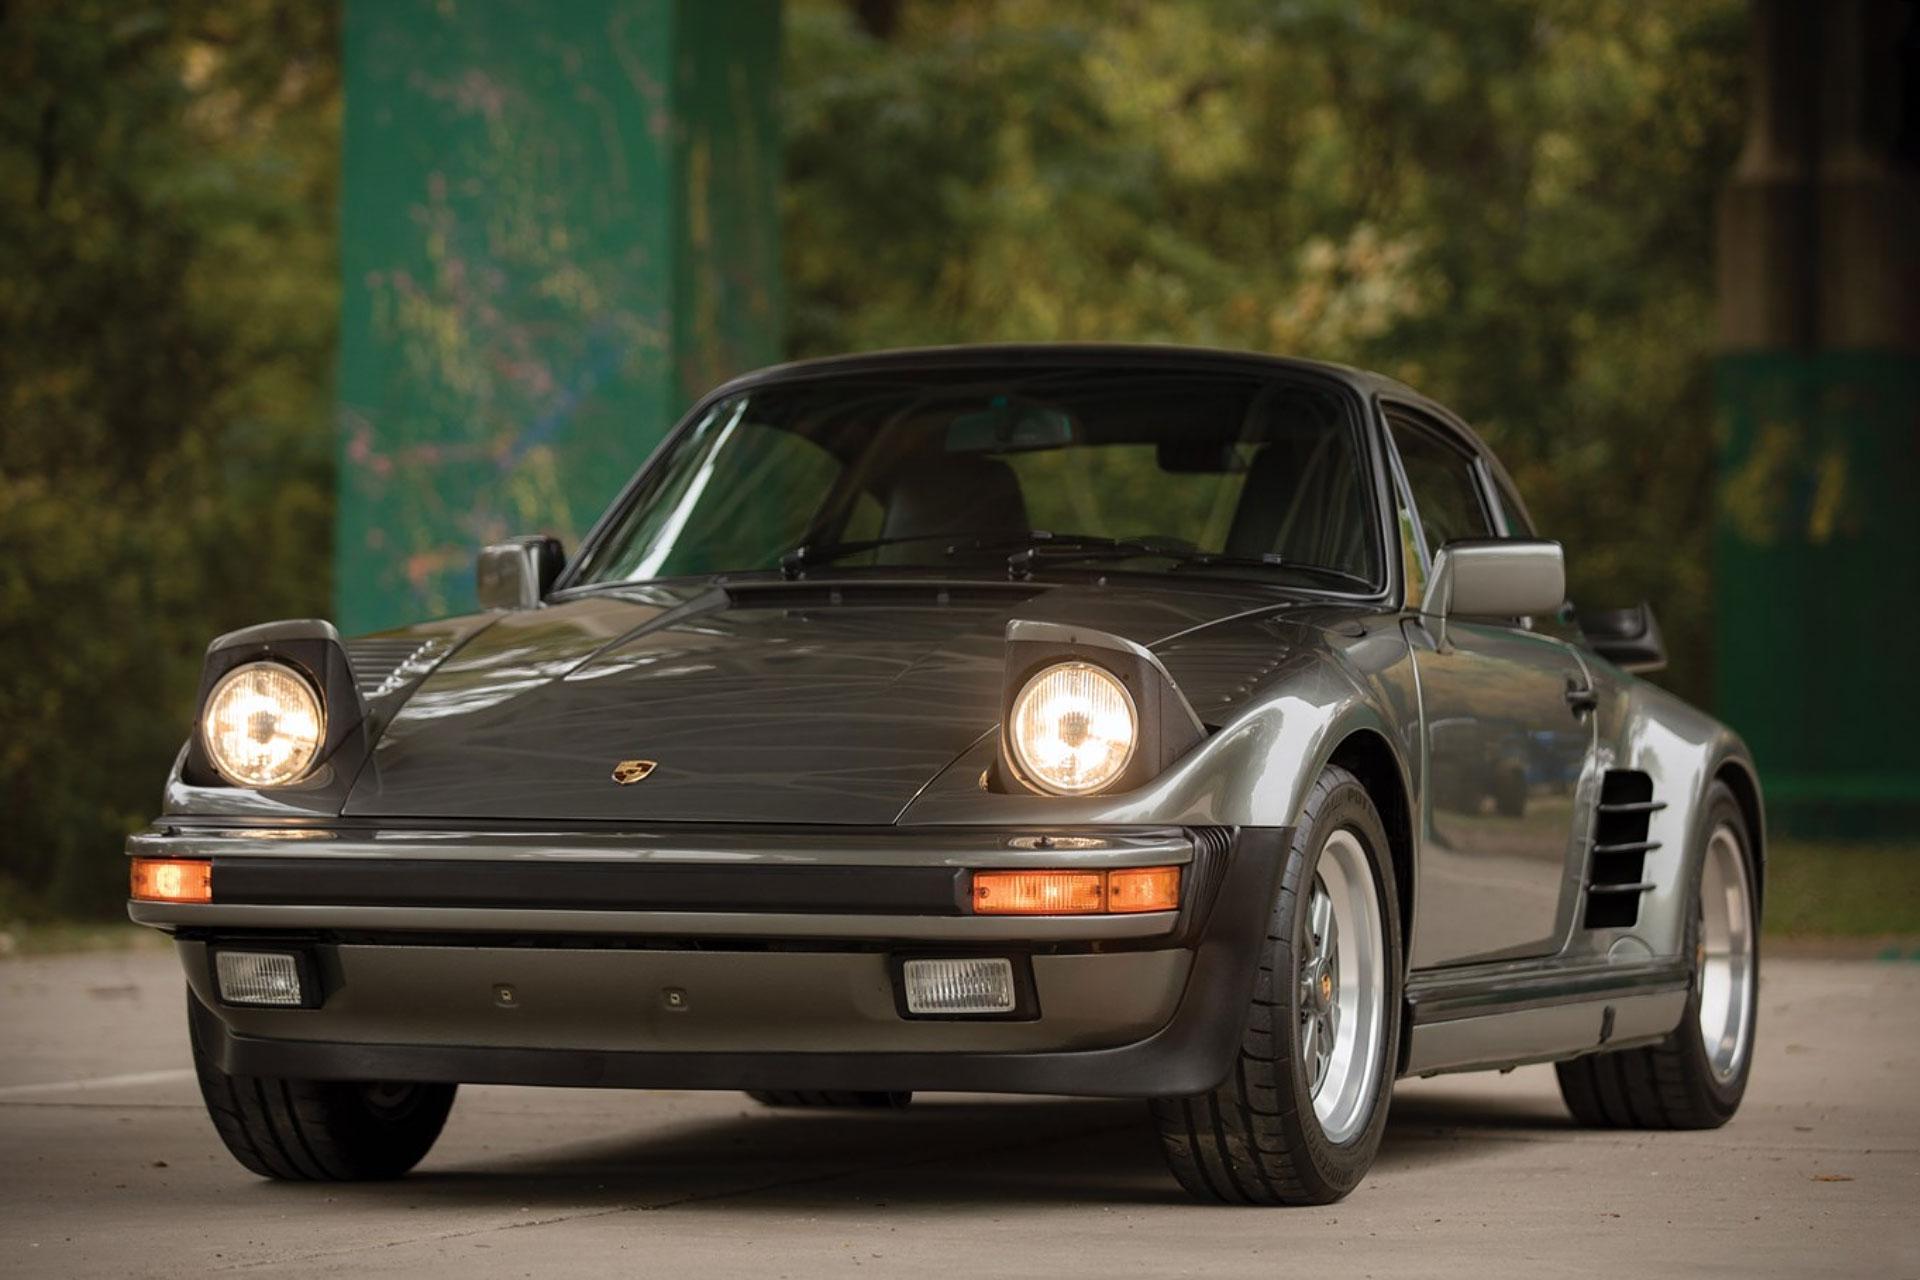 1988 Porsche 911 Turbo Flat Nose